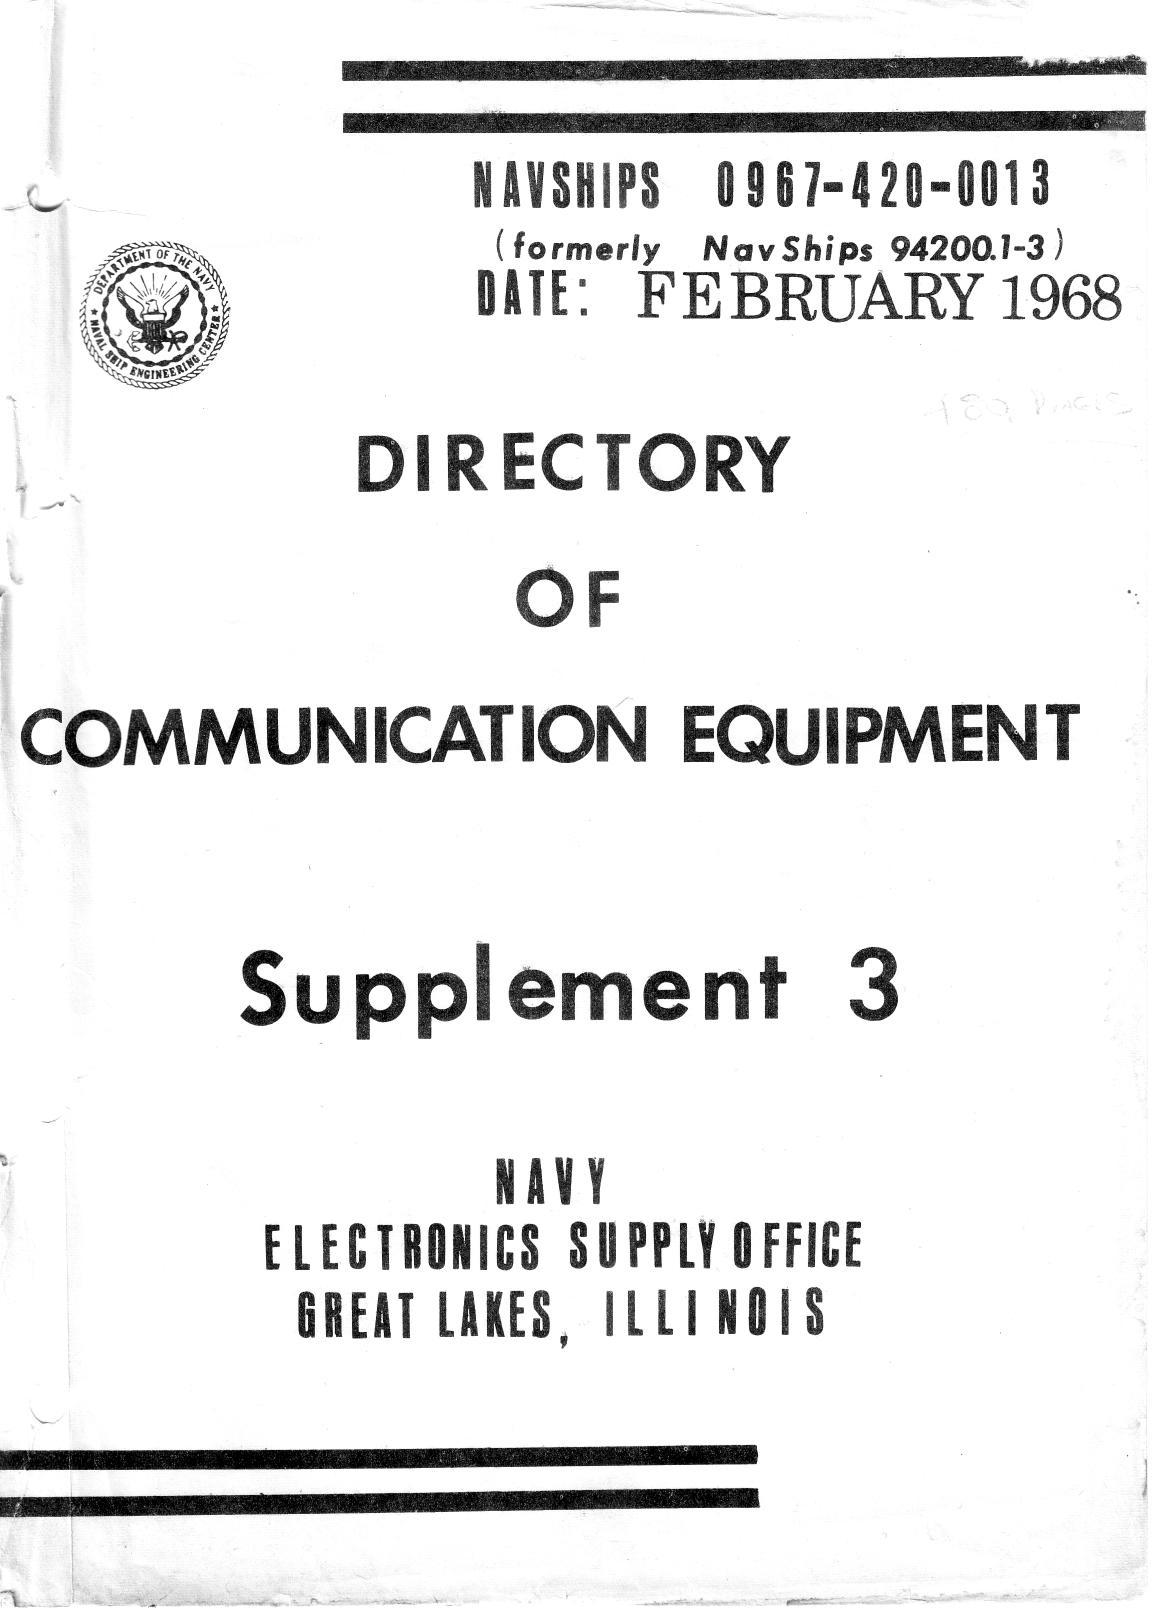 US Navy Directory of Communication Equipment NAVSHIPS 94200